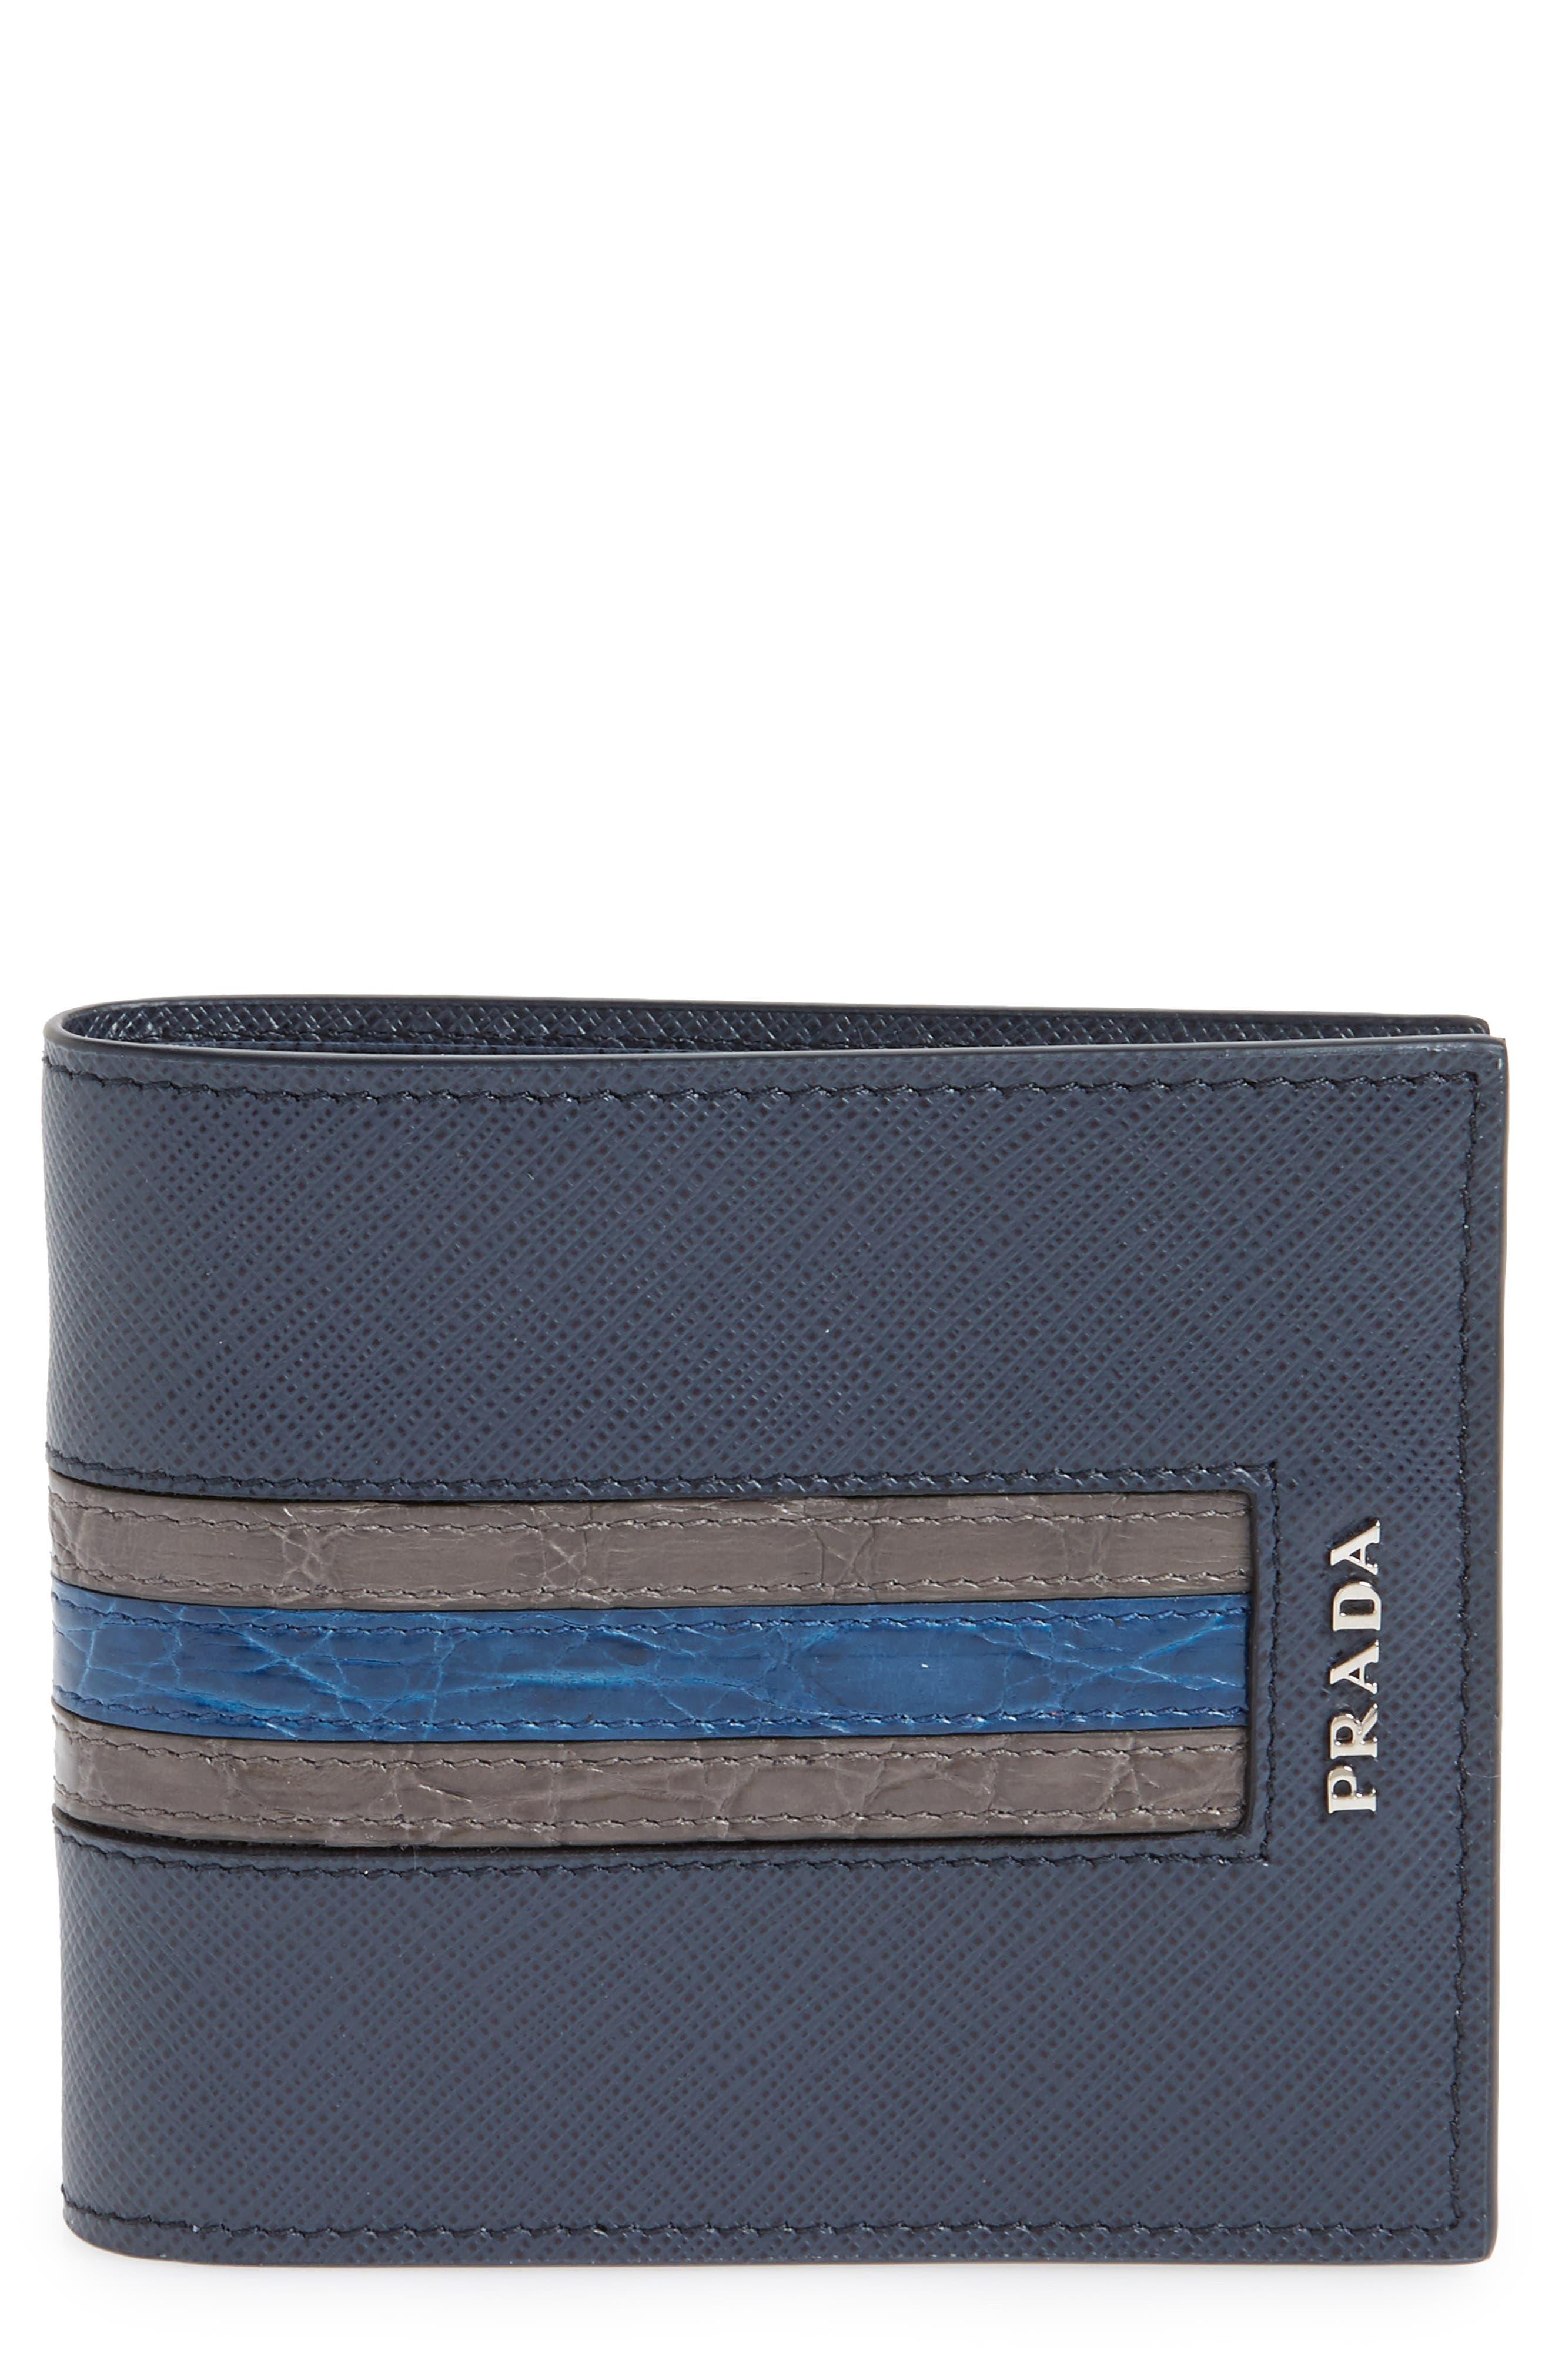 Prada Saffiano and Crocodile Leather Wallet